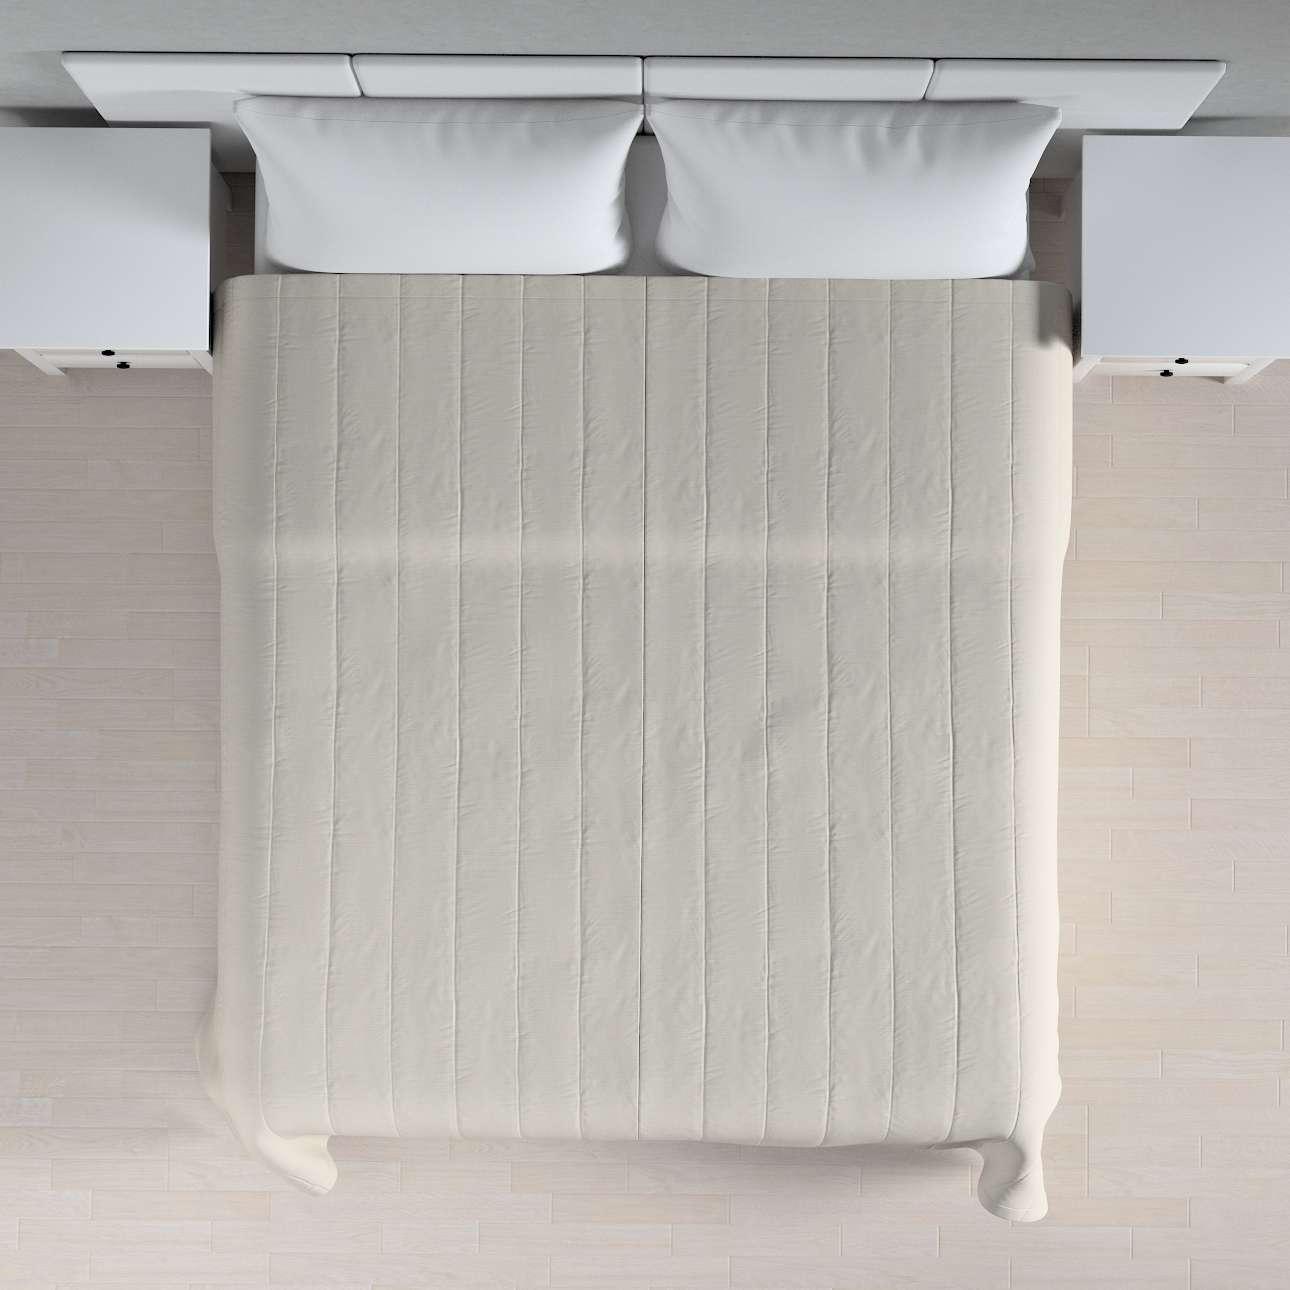 Narzuta pikowana w pasy w kolekcji Cotton Panama, tkanina: 702-31